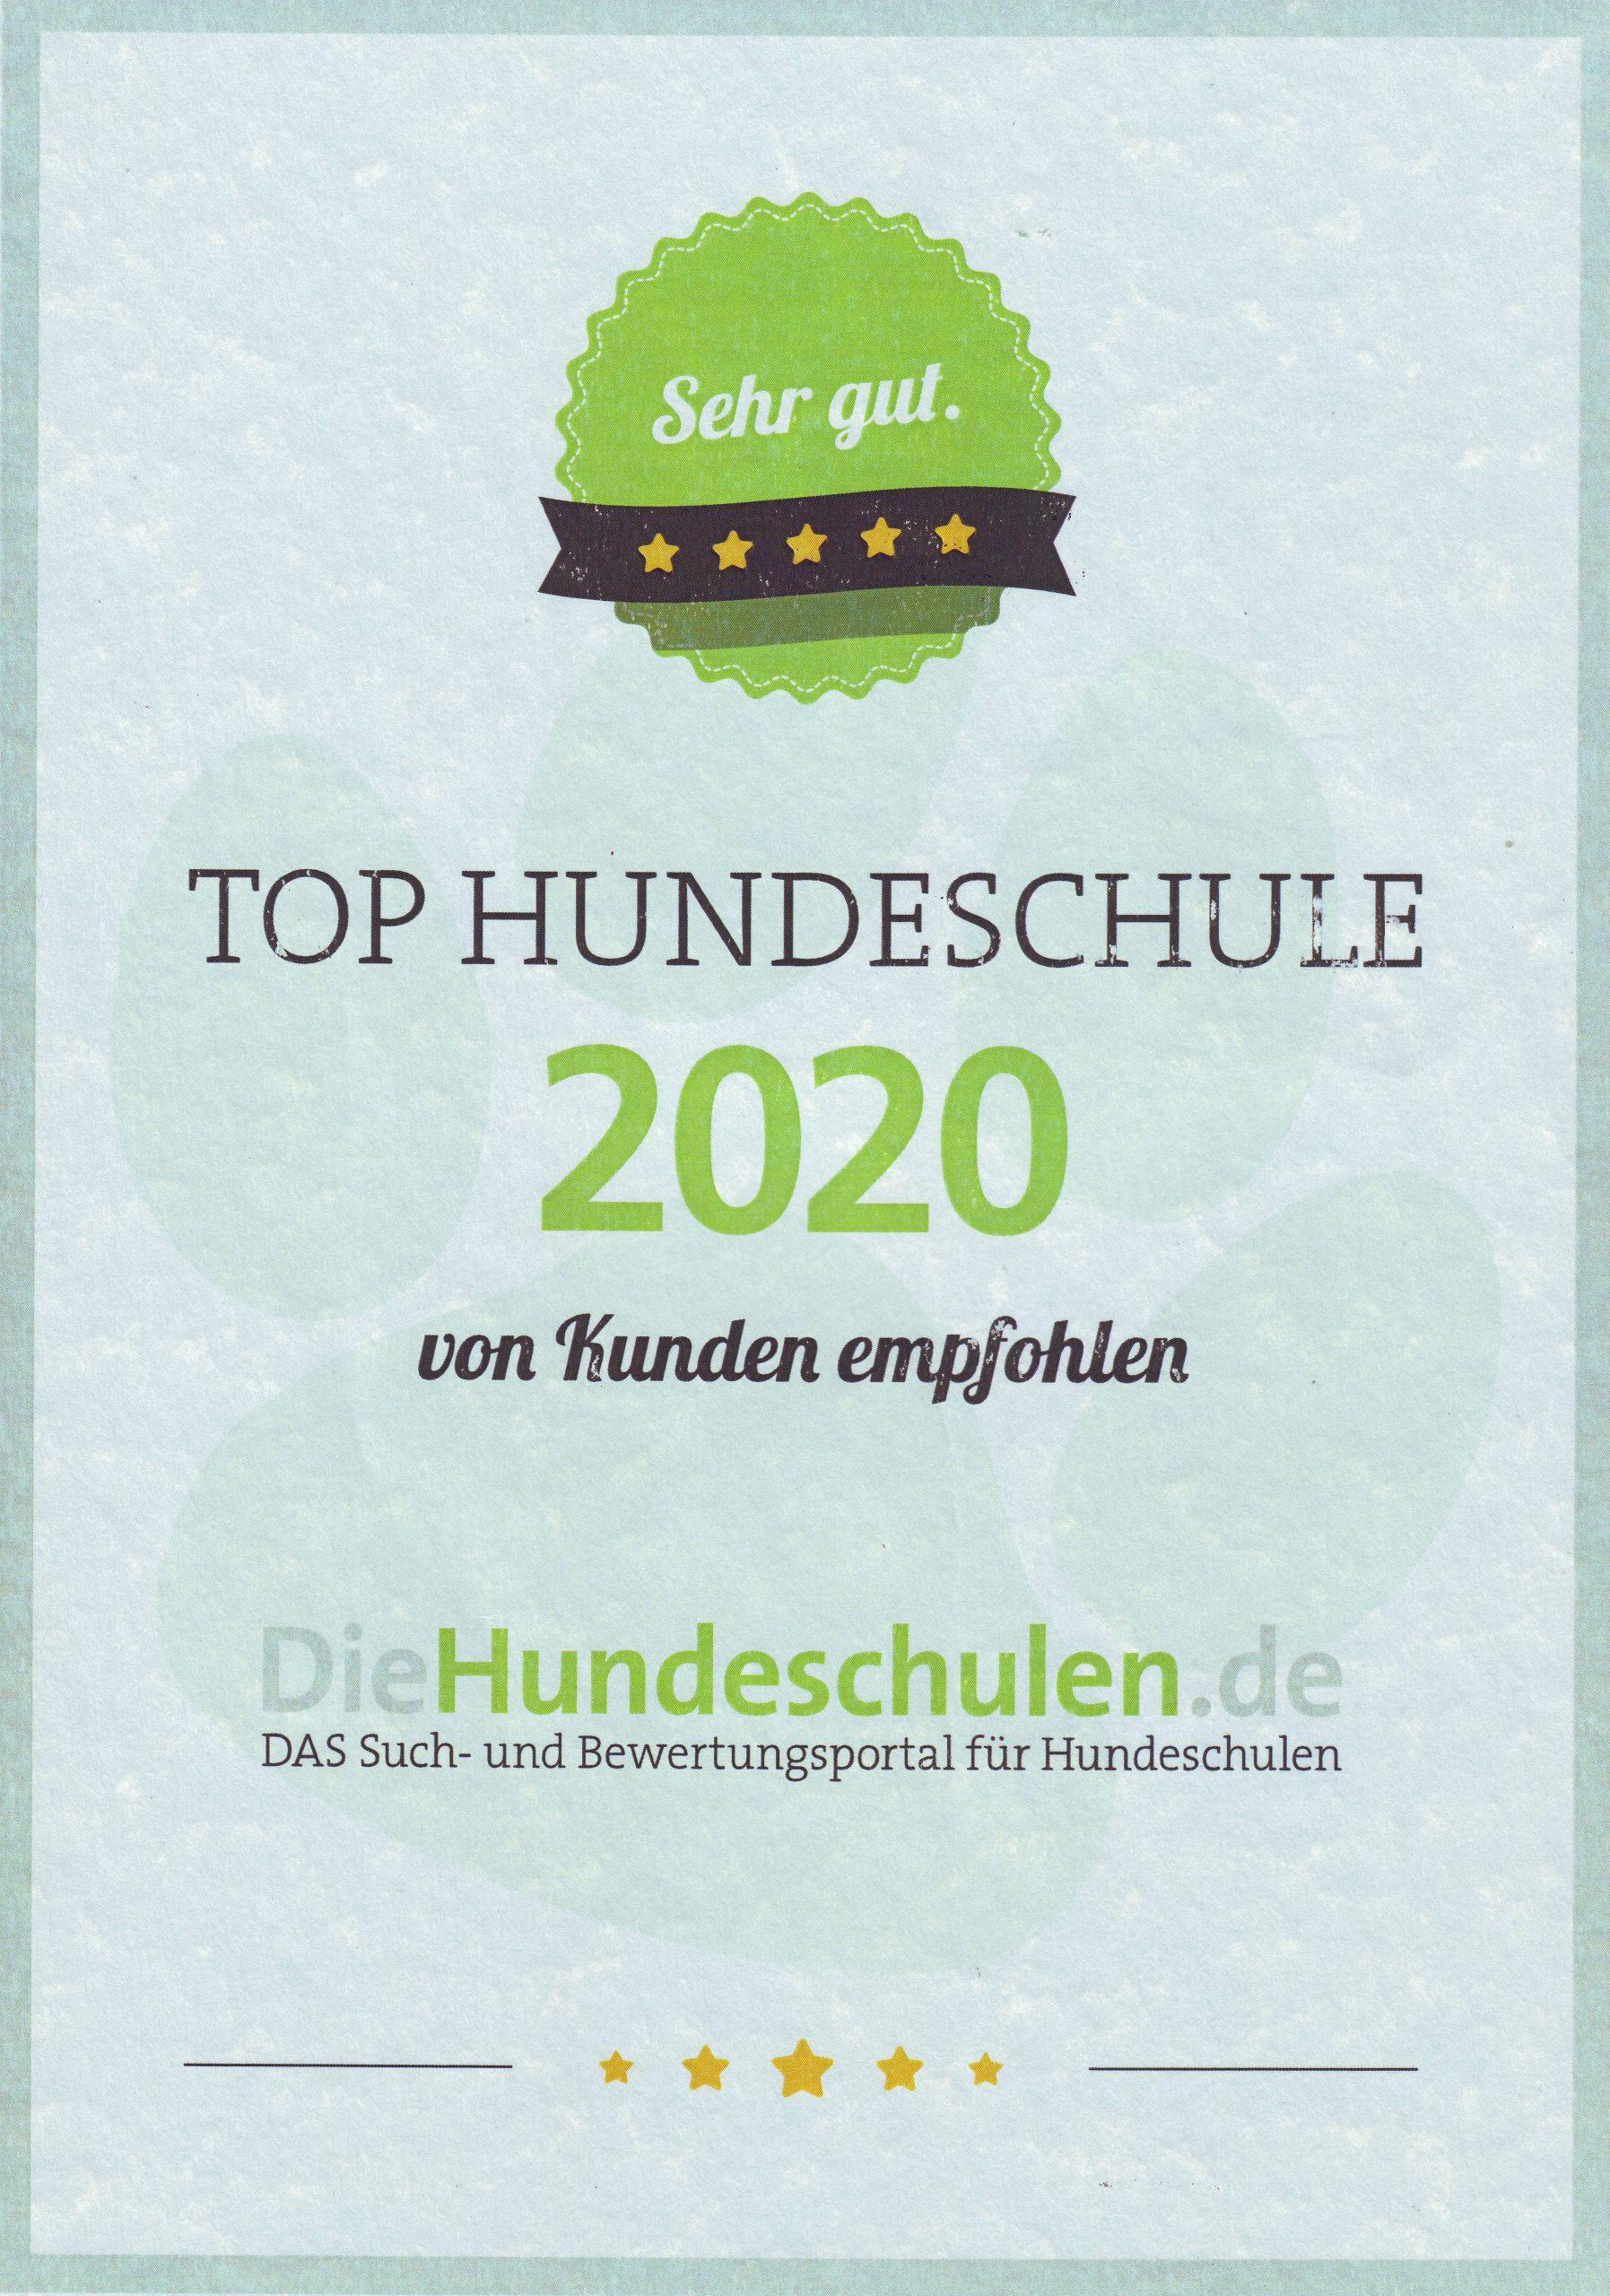 UrkundeHundeschulenAward2020